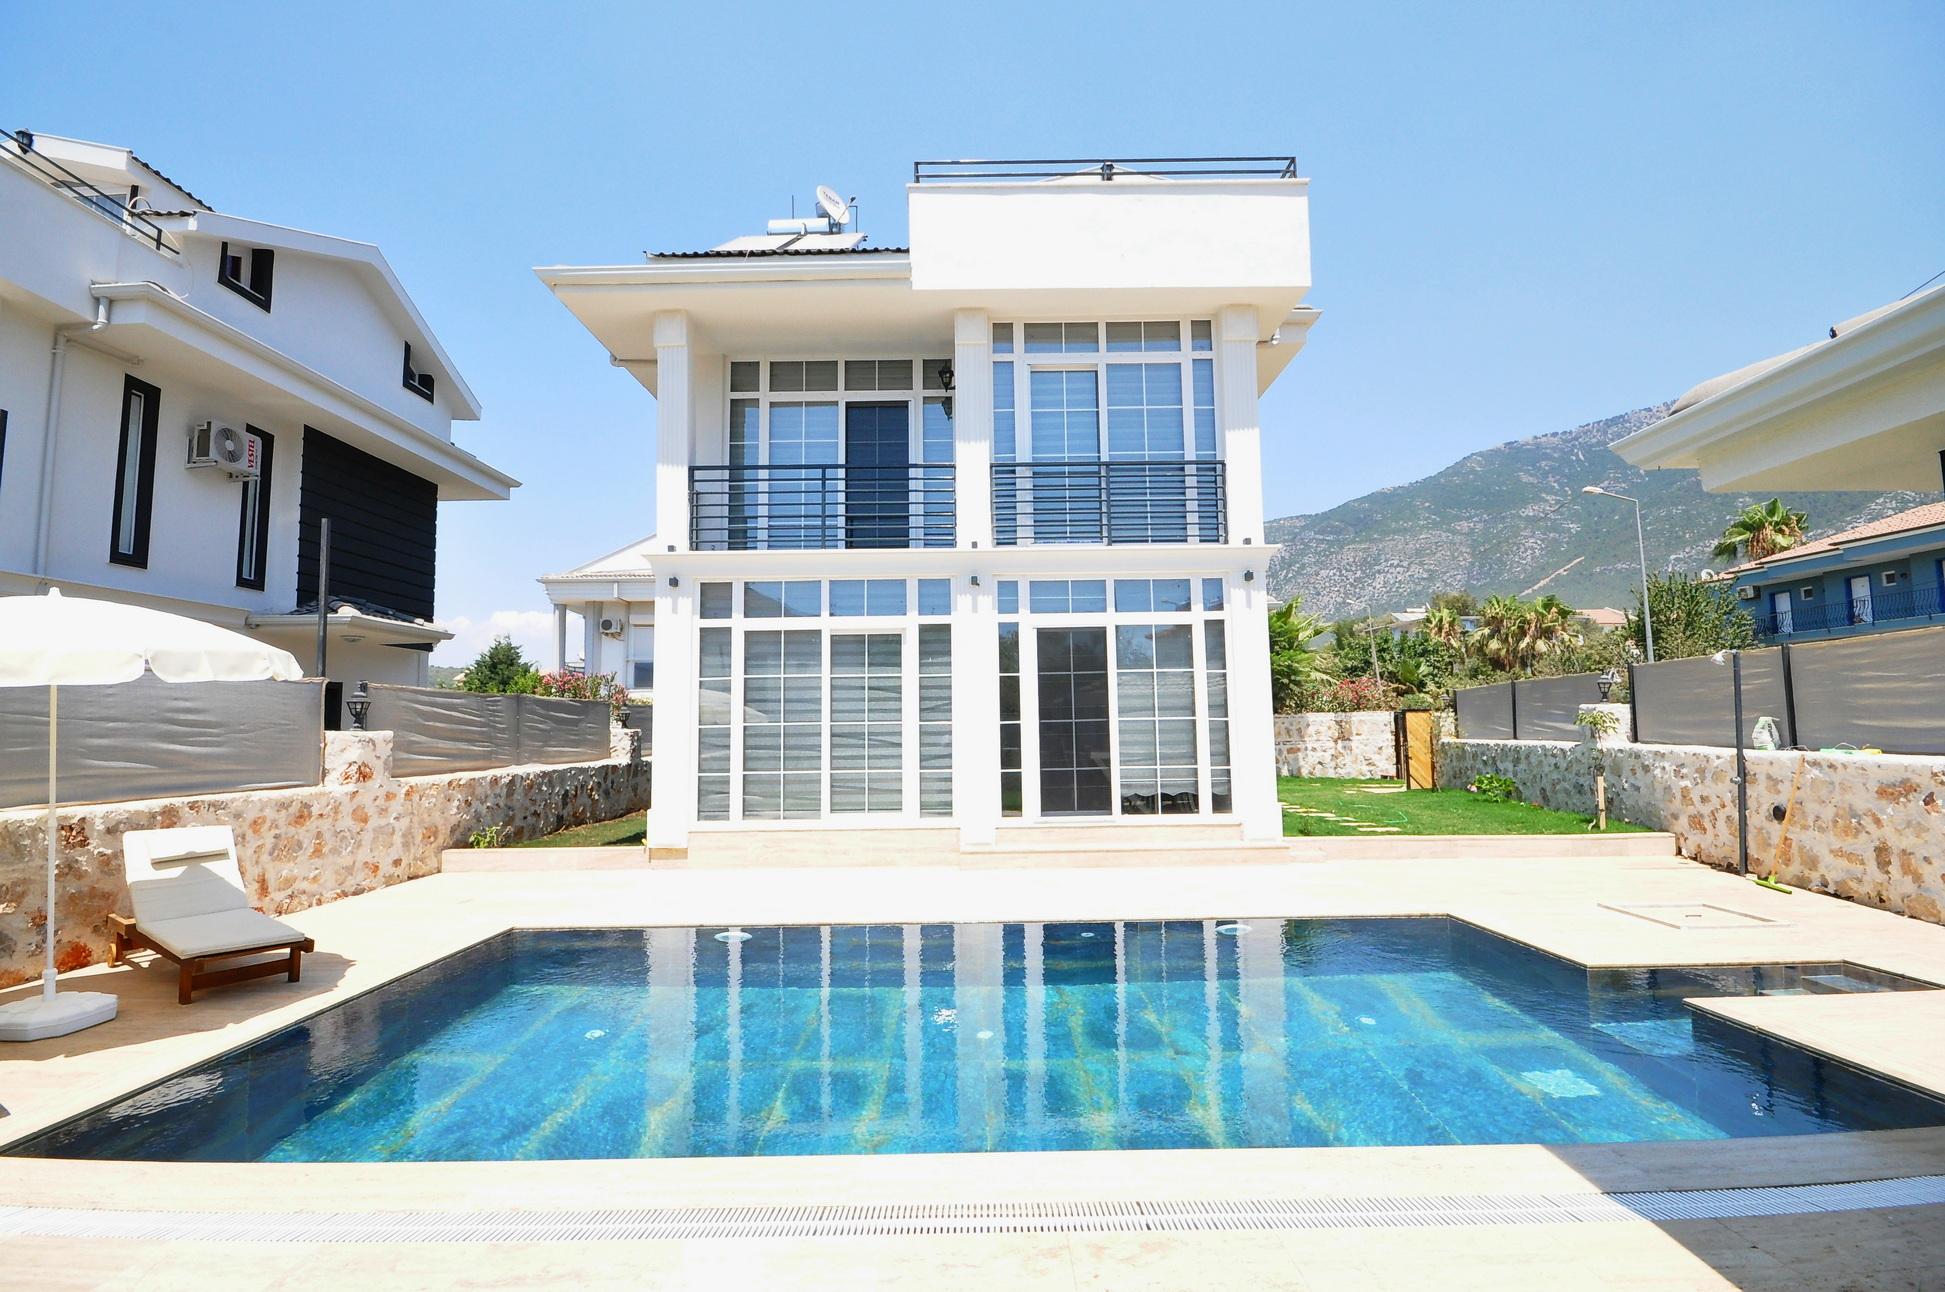 Attractive Brand New 3 Bedroom Triplex Villa in Ovacik